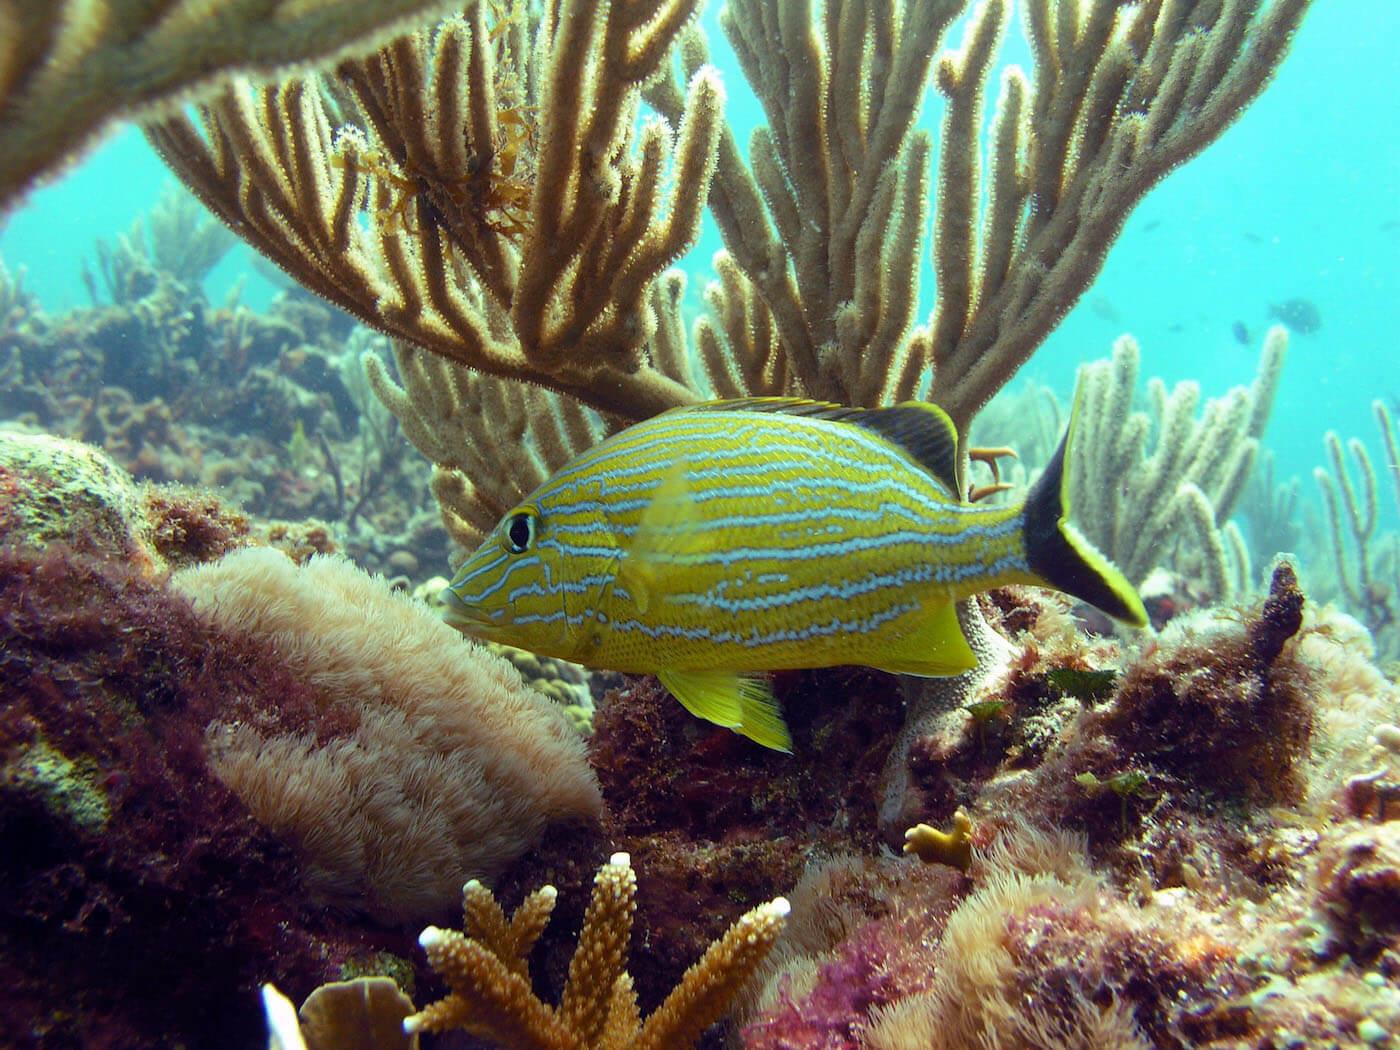 Isla Mujeres Scuba Diving Snorkeling Manchones Reef Squalo Adventures-4